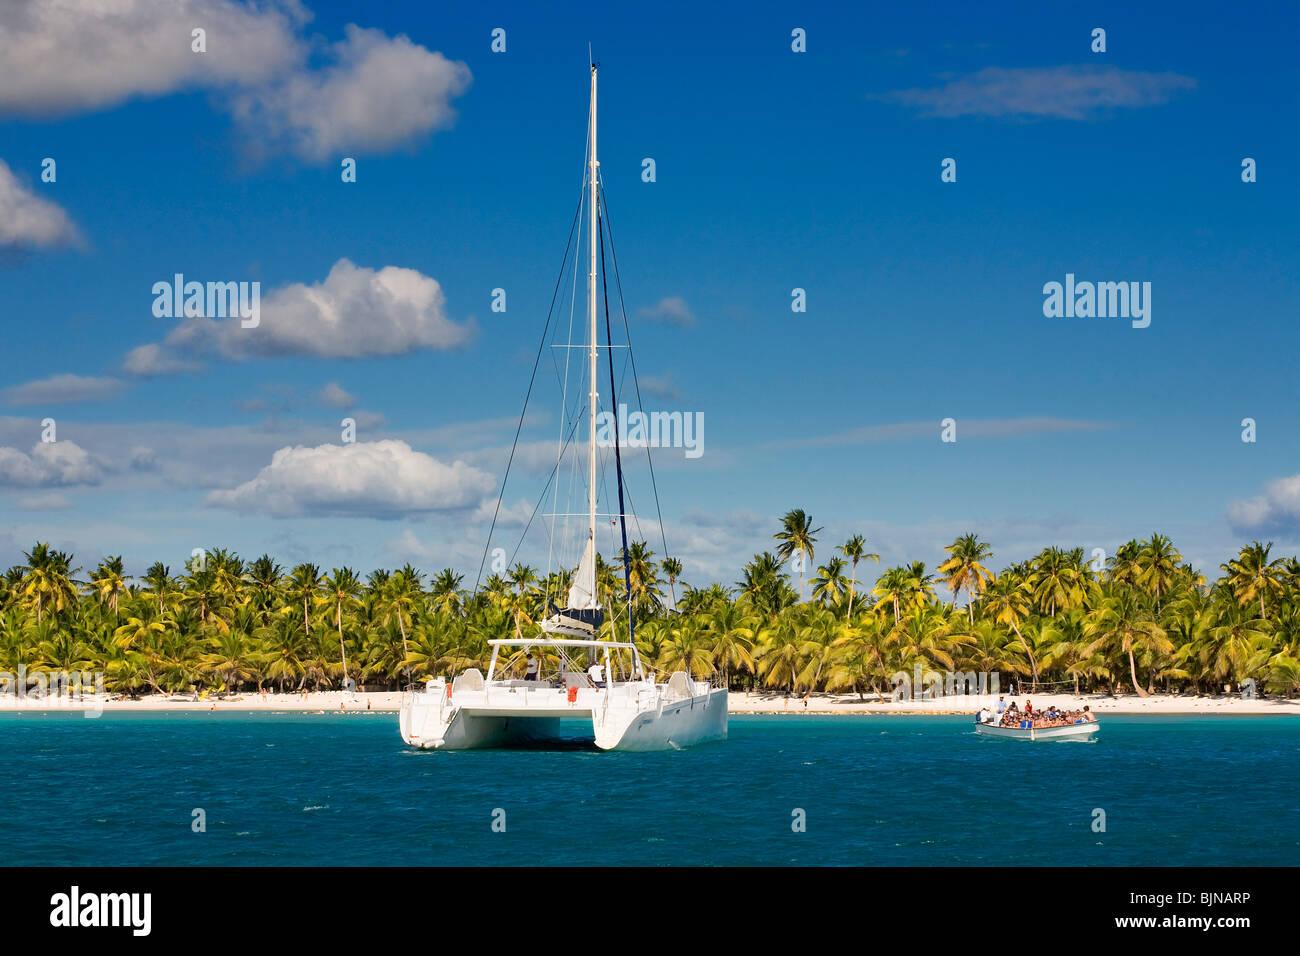 Saona Island, Dominican Republic - Stock Image